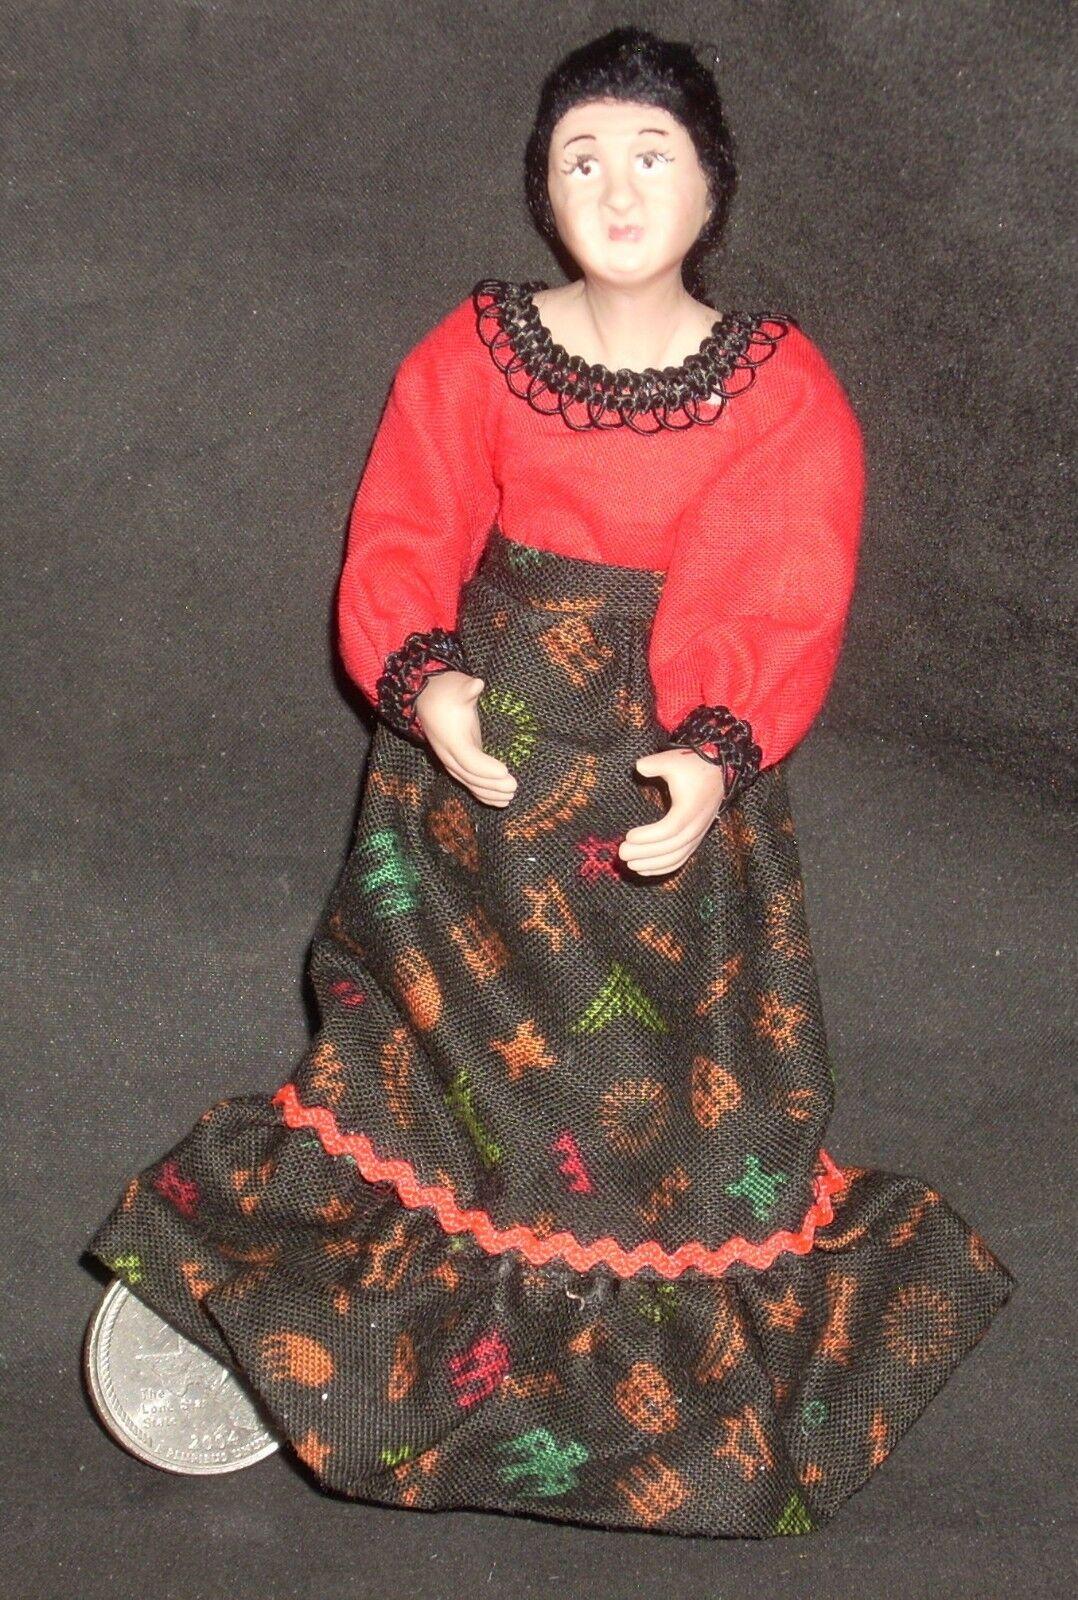 1:12 Dollhouse Miniature Doll Older Hispanic Mexican Woman Ceramic  9848 Thomas